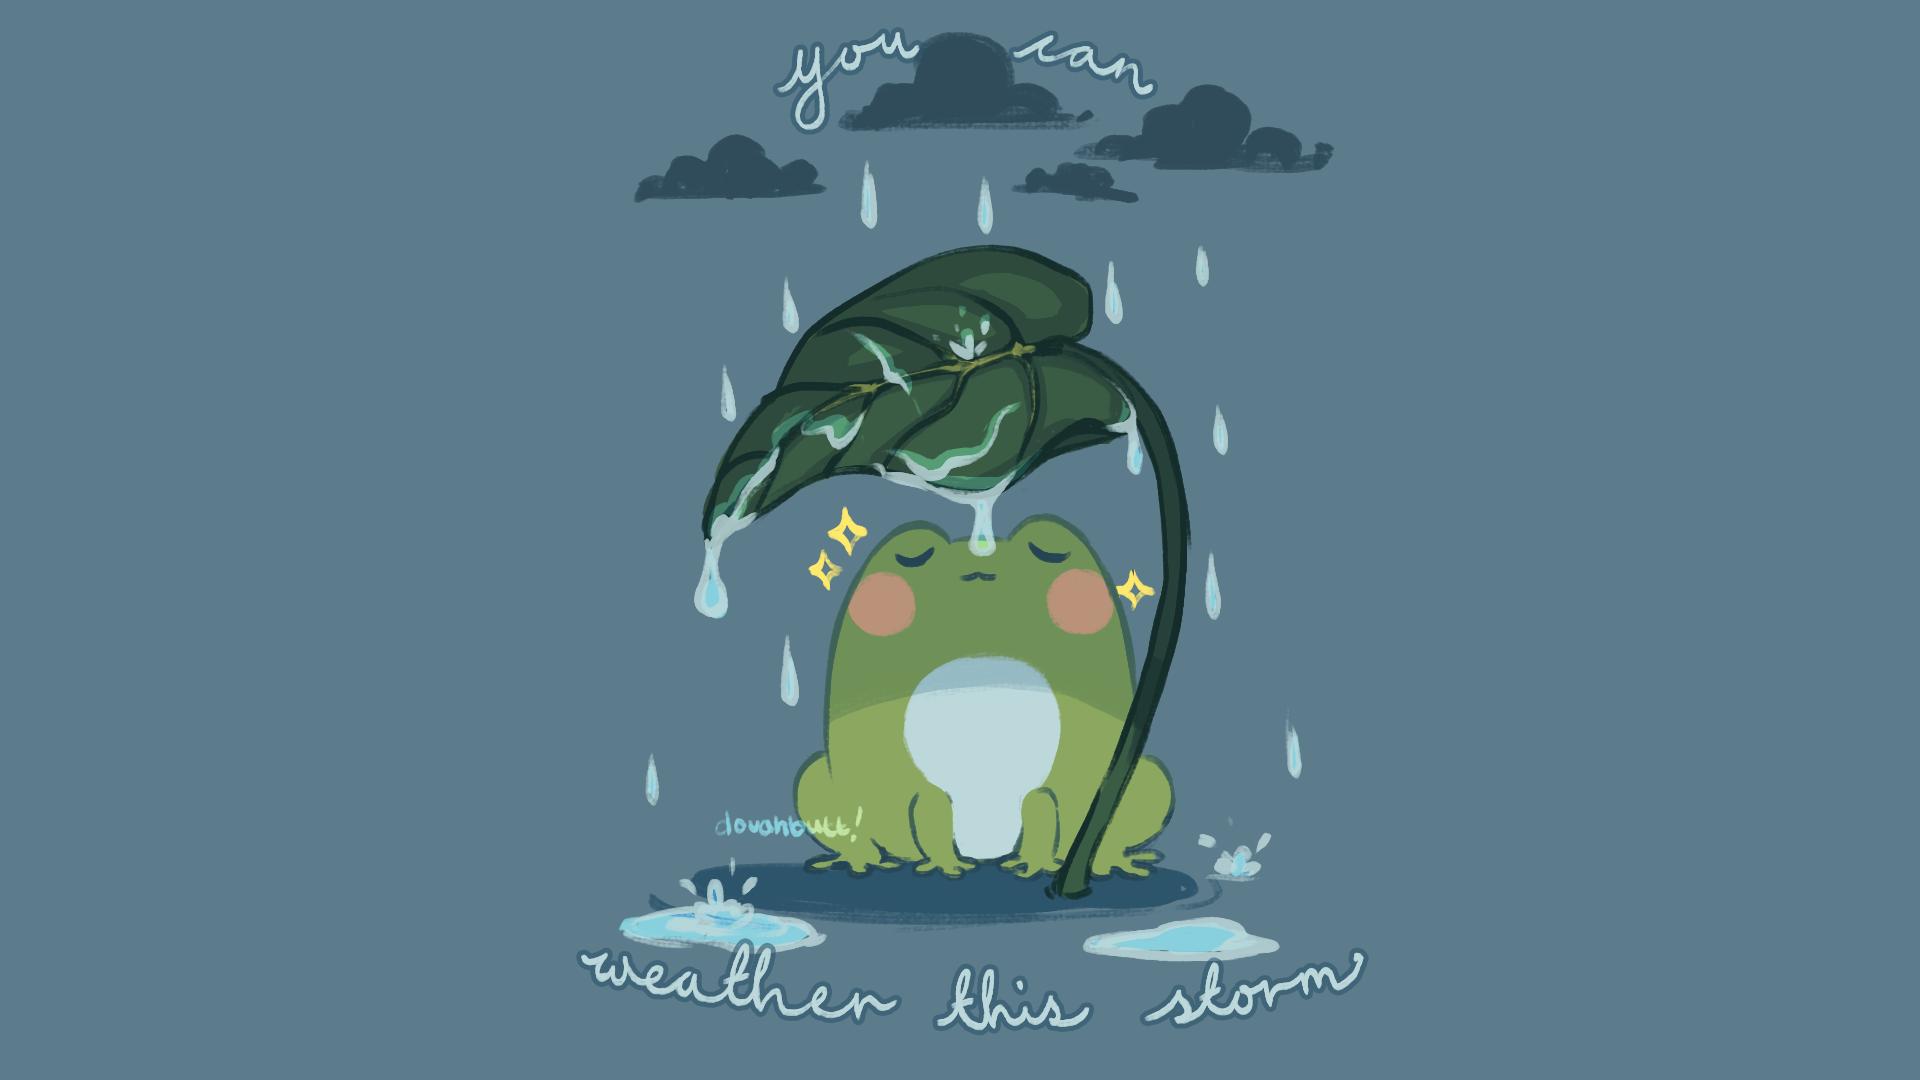 fwog in the rain